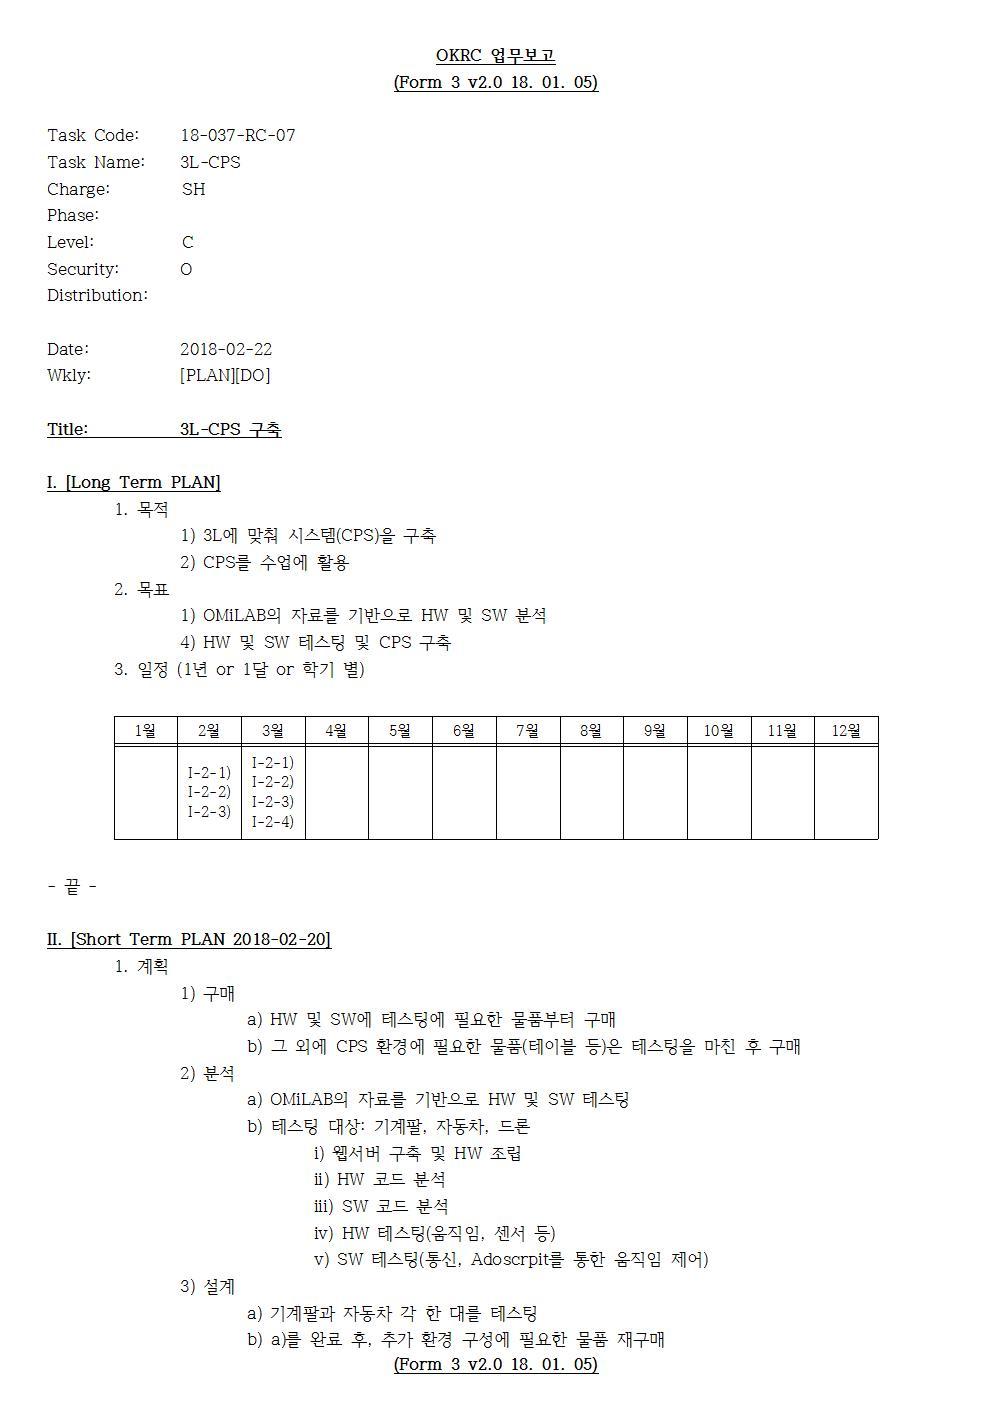 D-[18-037-RC-07]-[3L-CPS]-[2018-02-22][SH]001.jpg